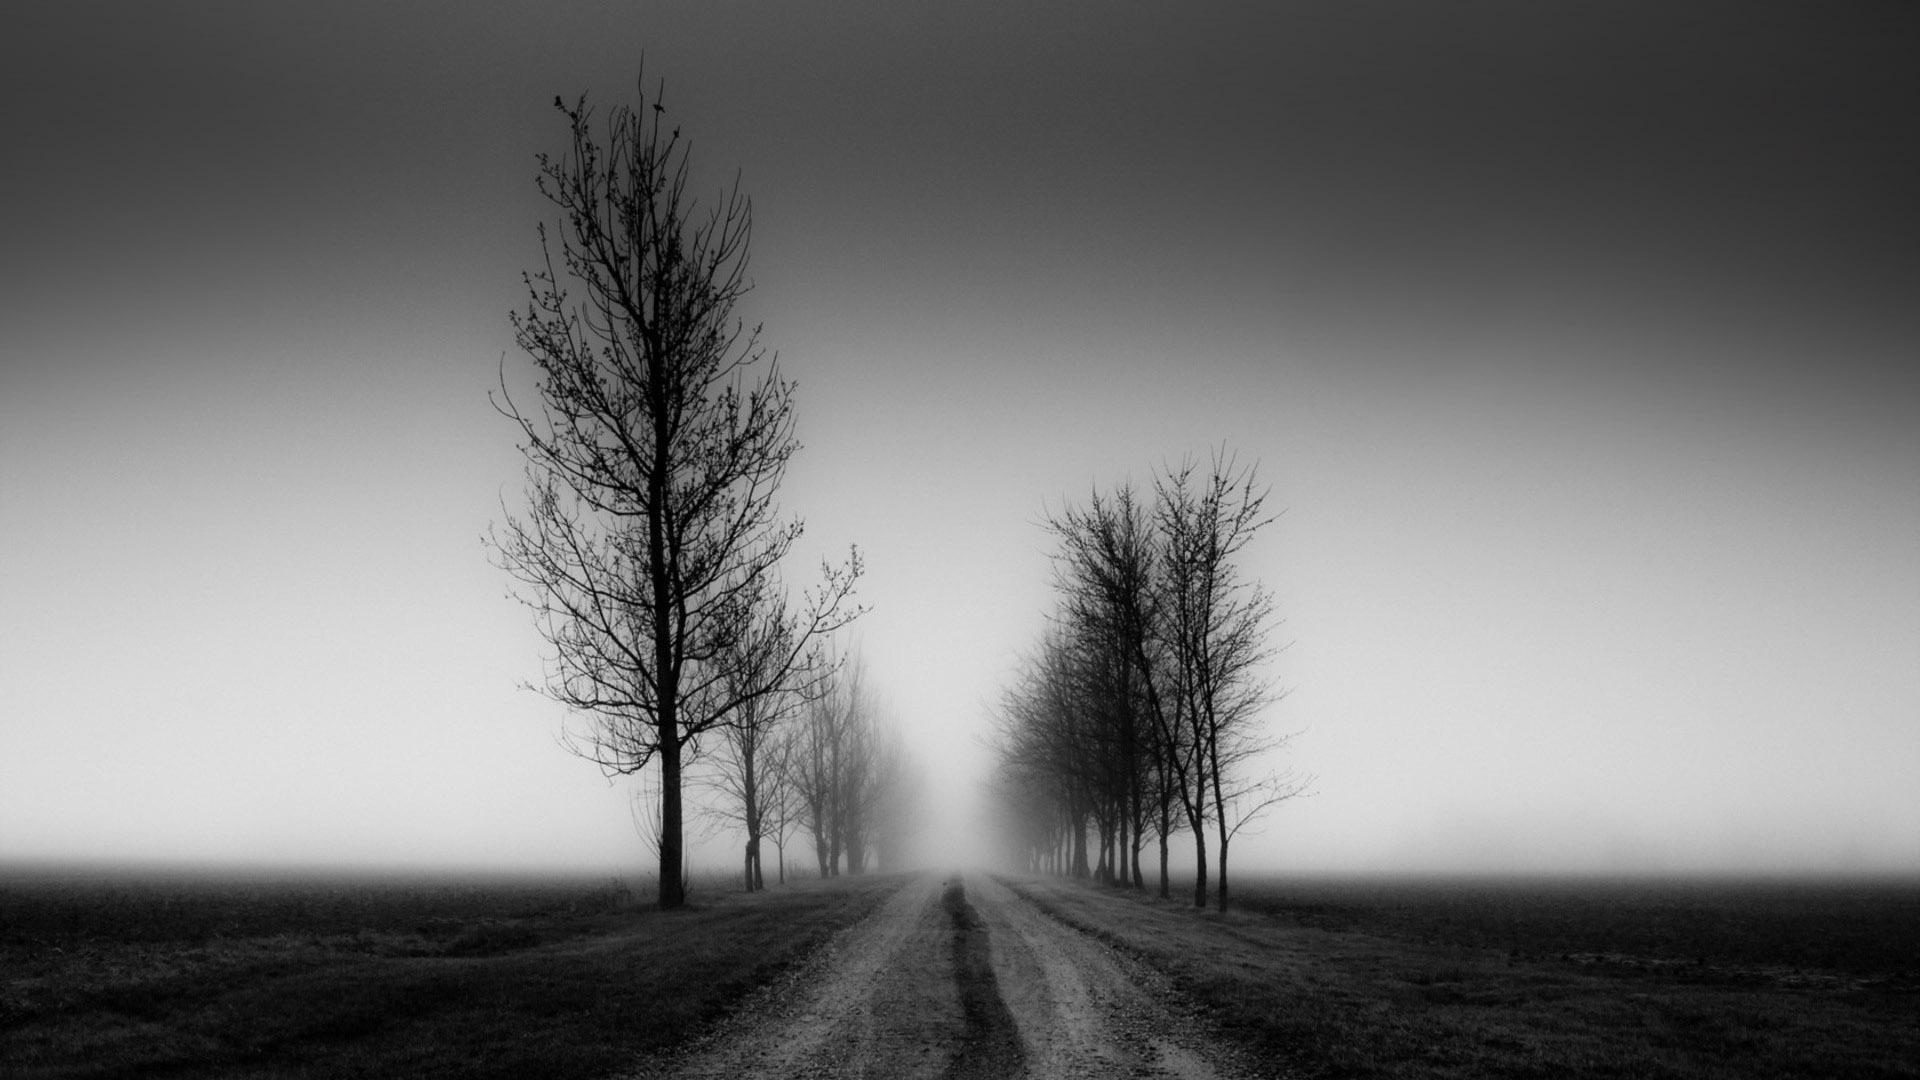 Nature landscapes trees fog black sky mood wallpaper   1920x1080